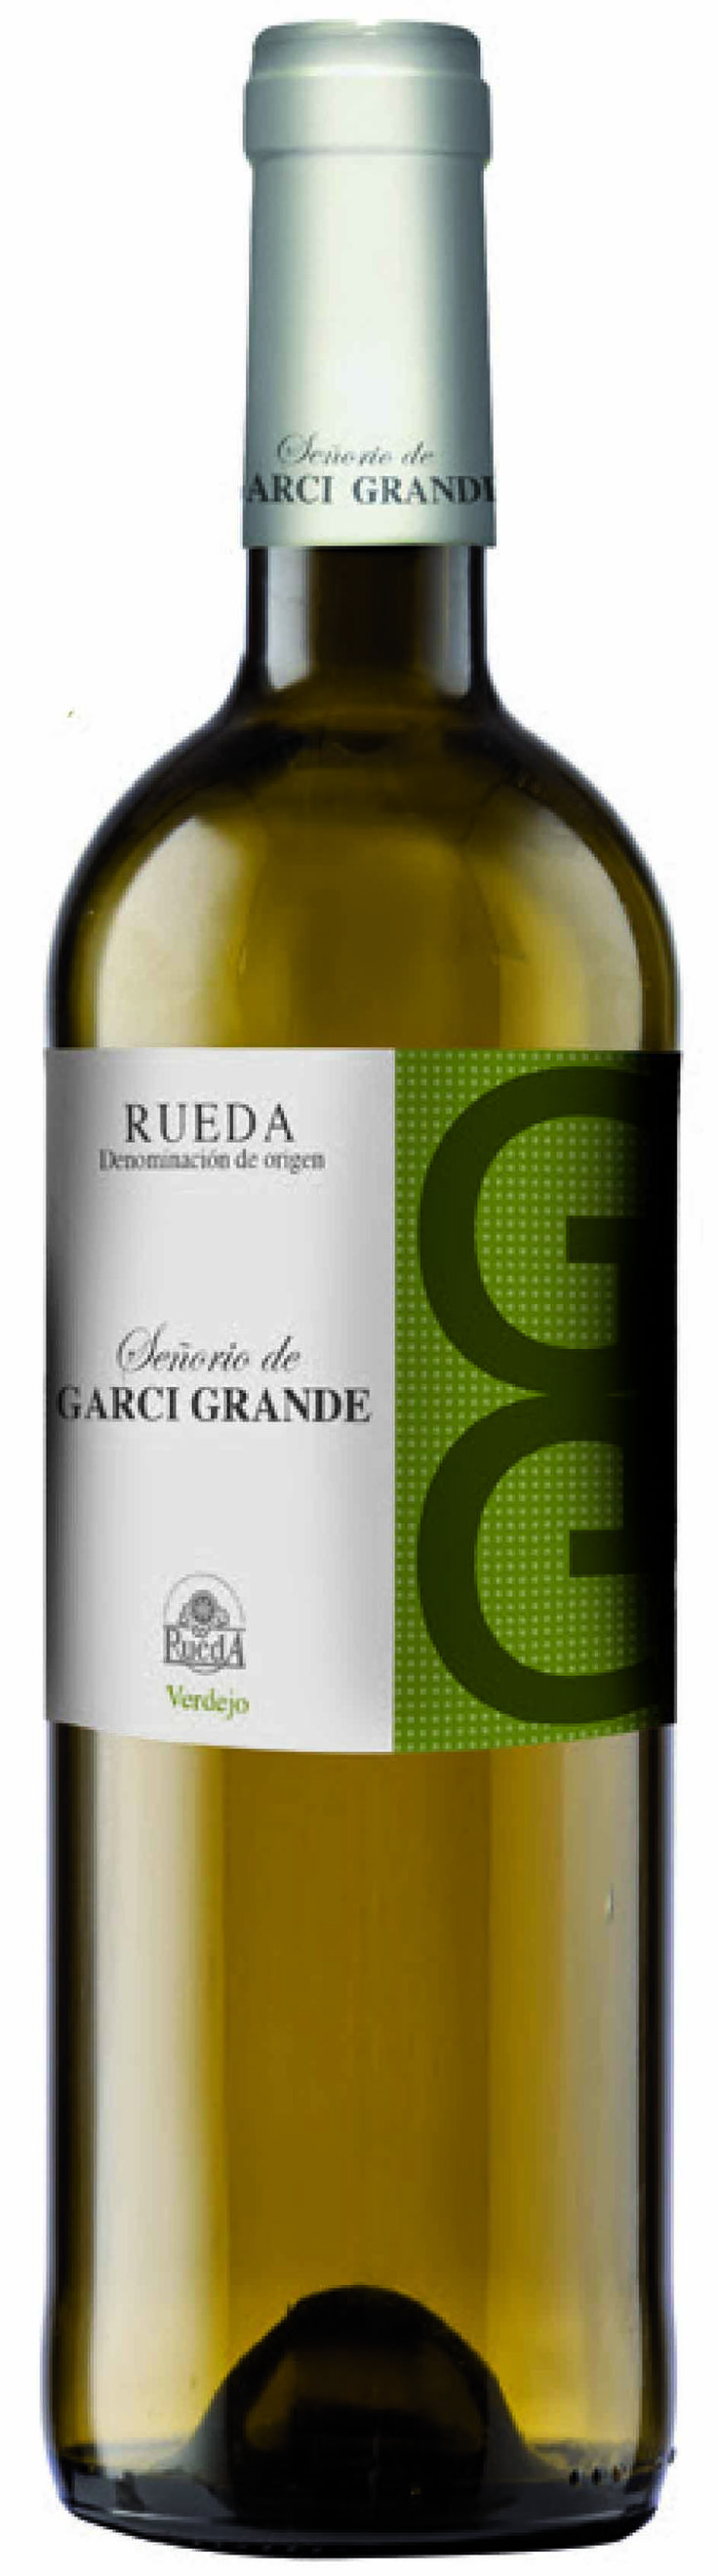 El mejor vino Rueda GarciGrande Verdejo #whitewine #wine #packaging #label #deign